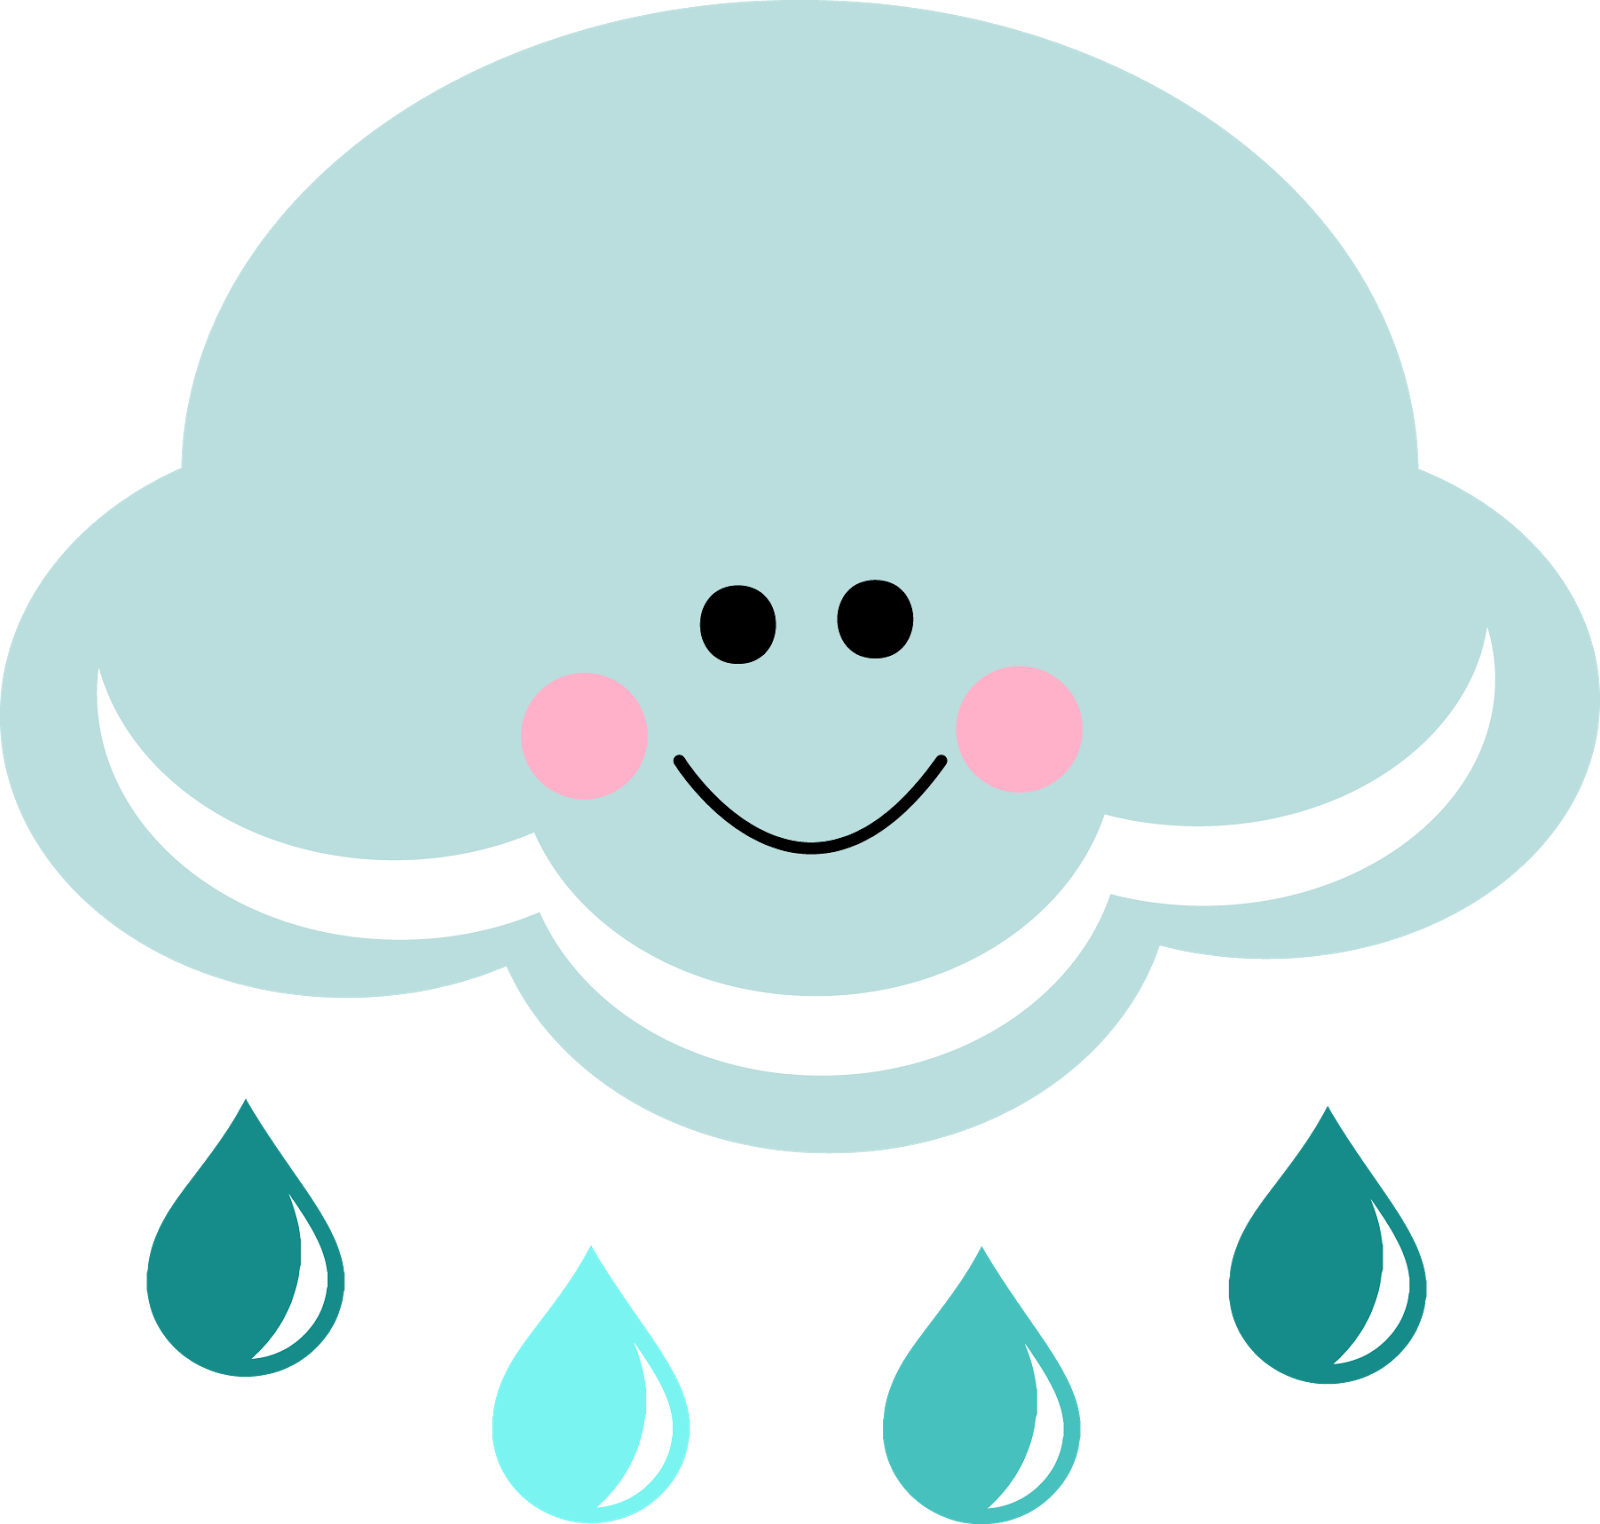 Rain Cloud Clip Art - ClipArt Best